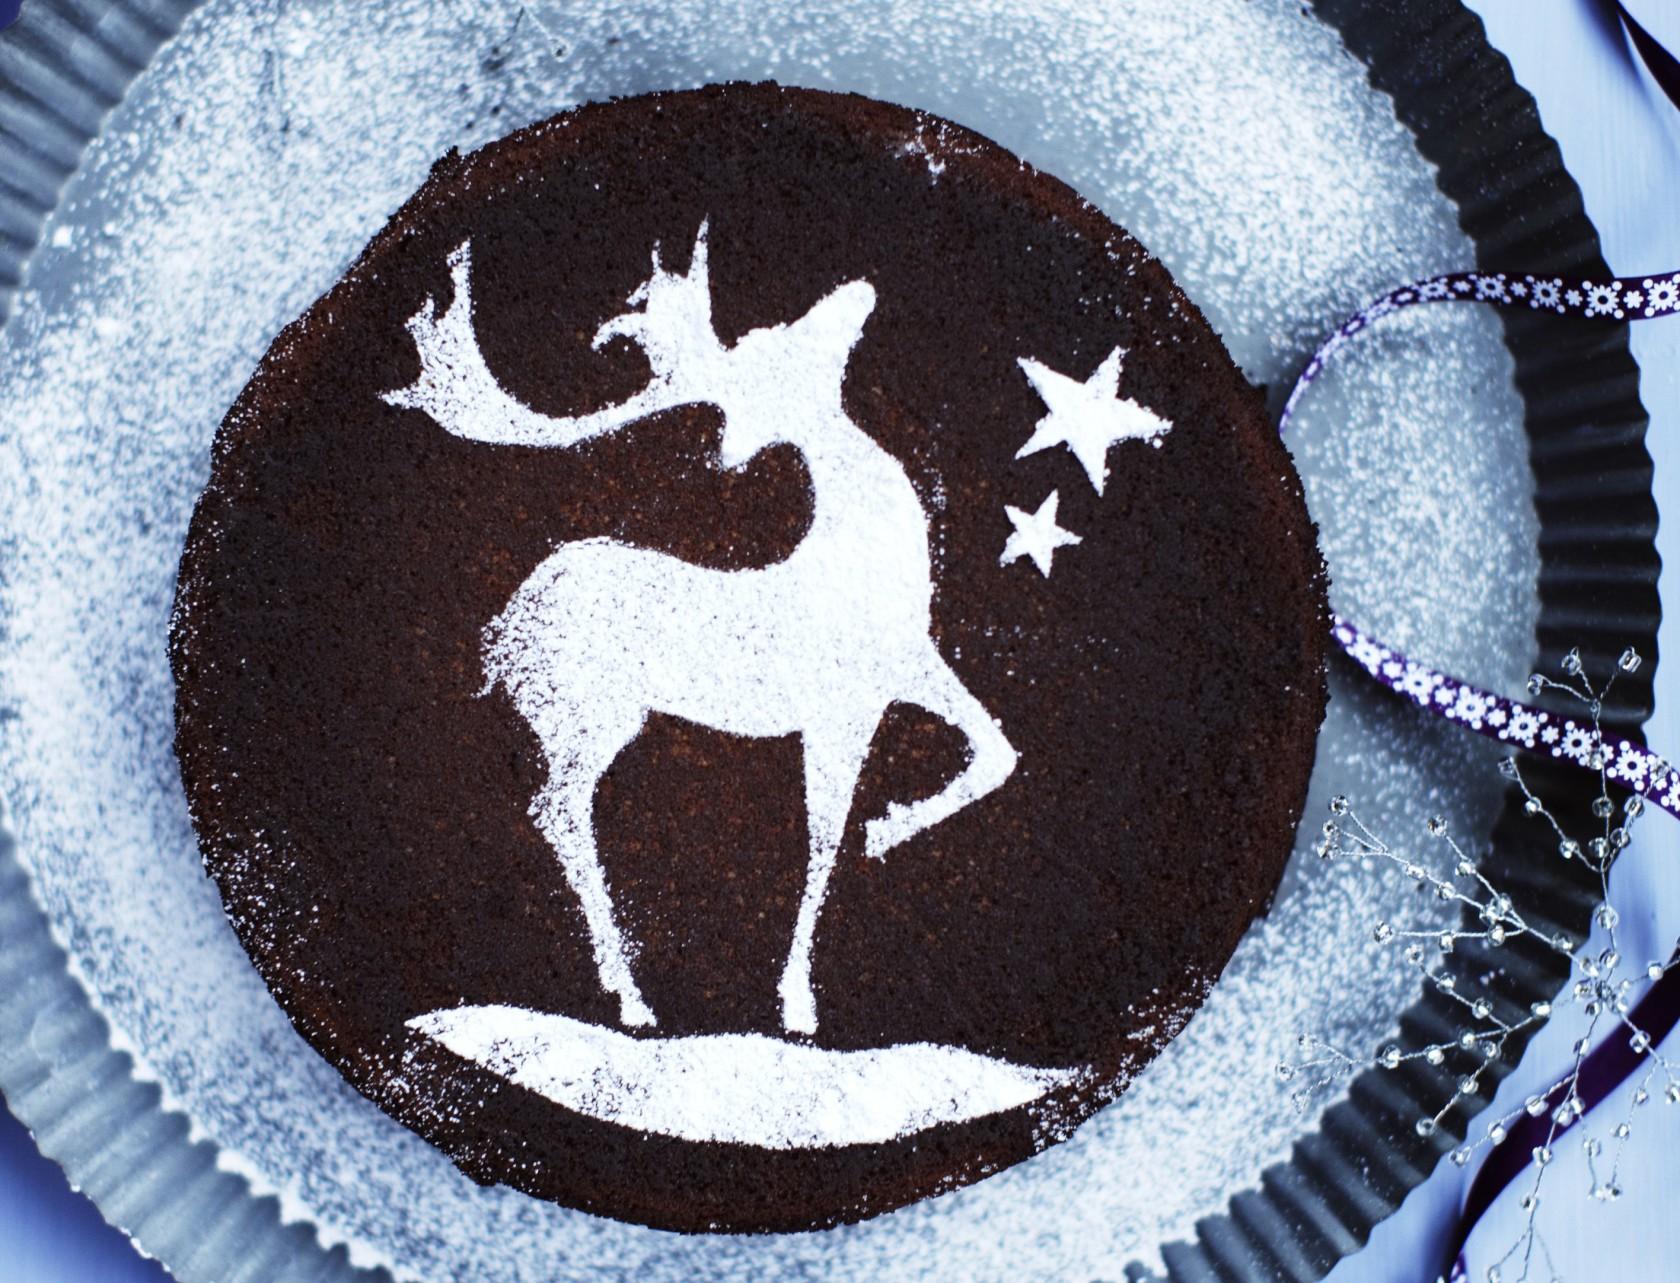 Chokoladekage med kaffe og hasselnødder